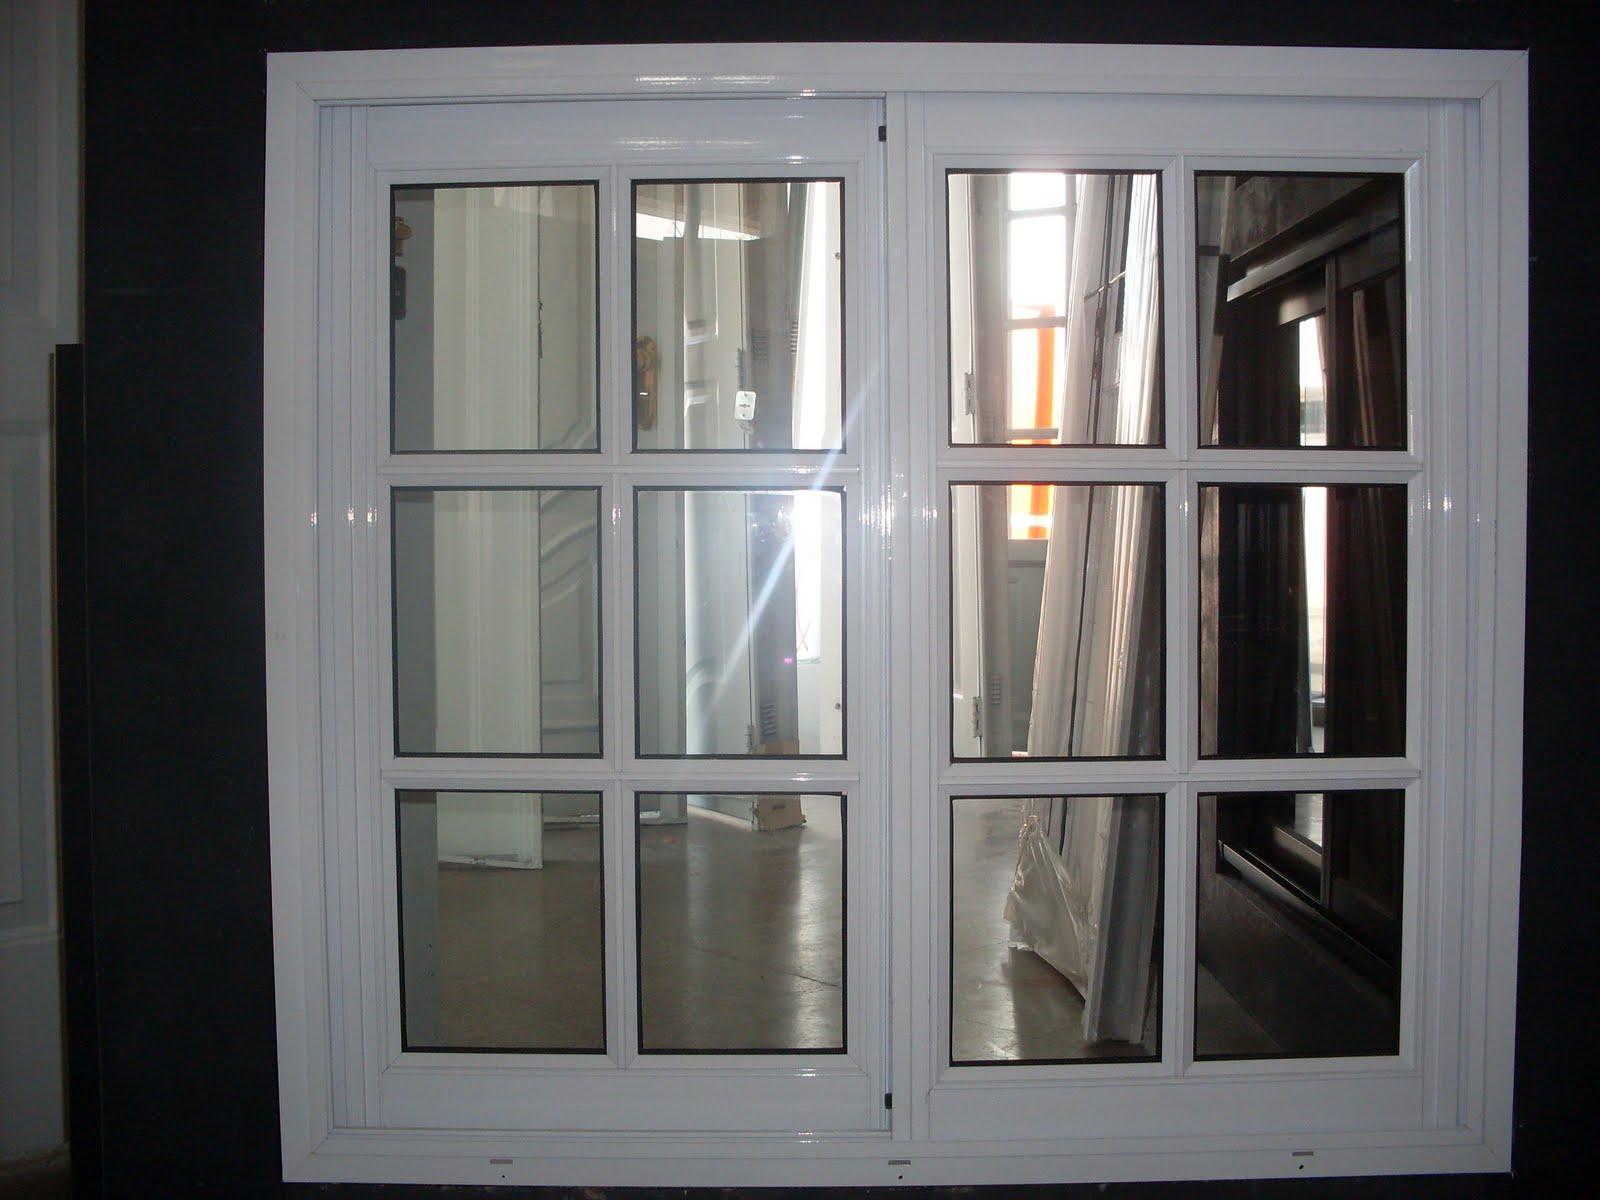 Aberturas vaquero ventanas aluminio - Bentanas de aluminio ...